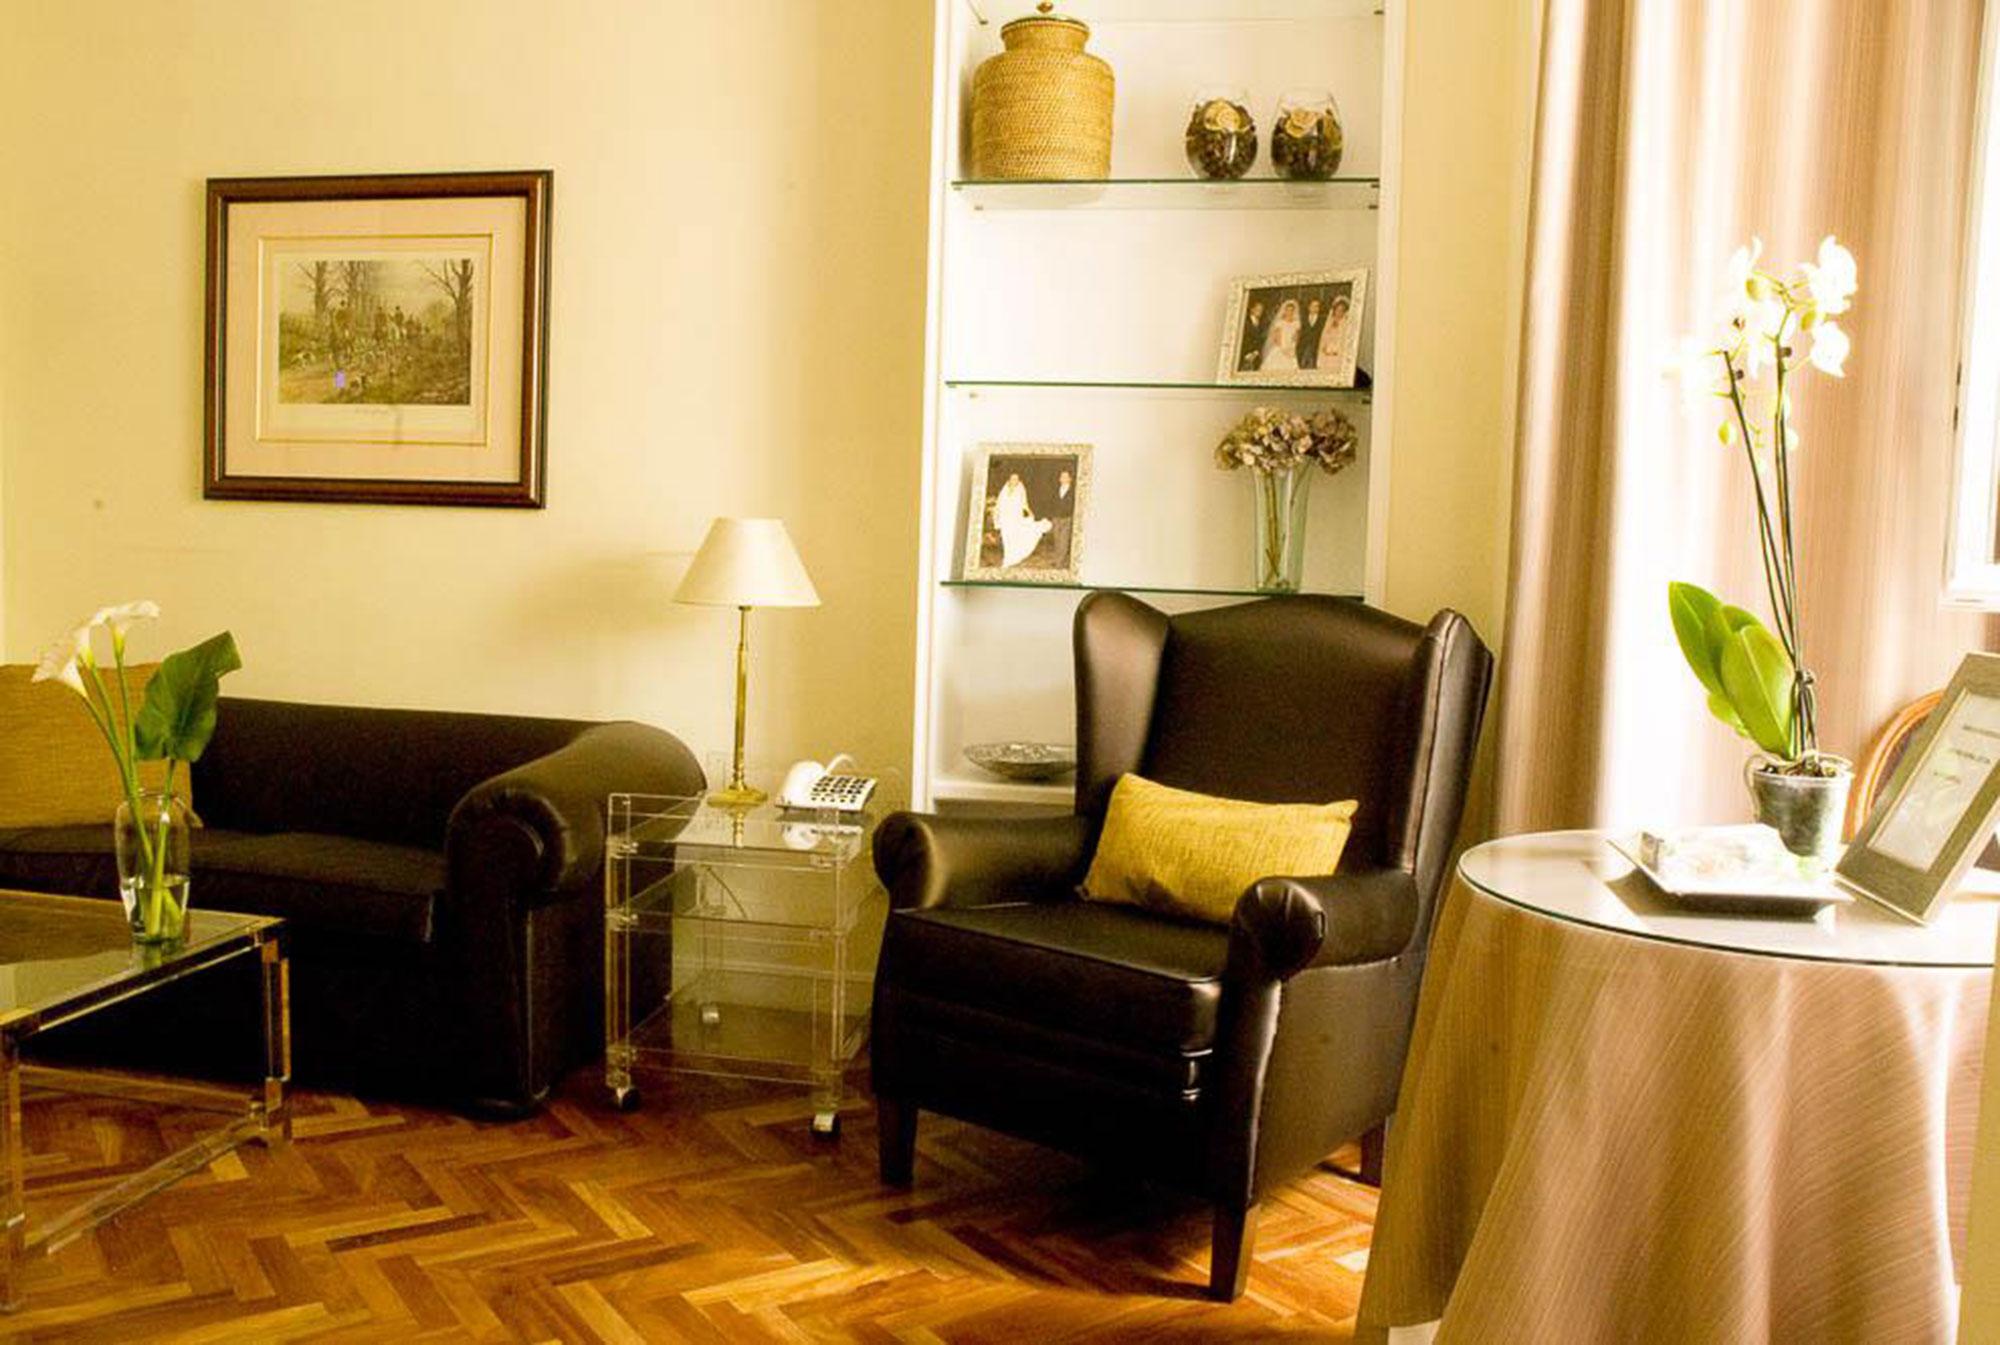 Apartamentos tutelados para mayores Arturo Soria - Madrid - Sanitas ...